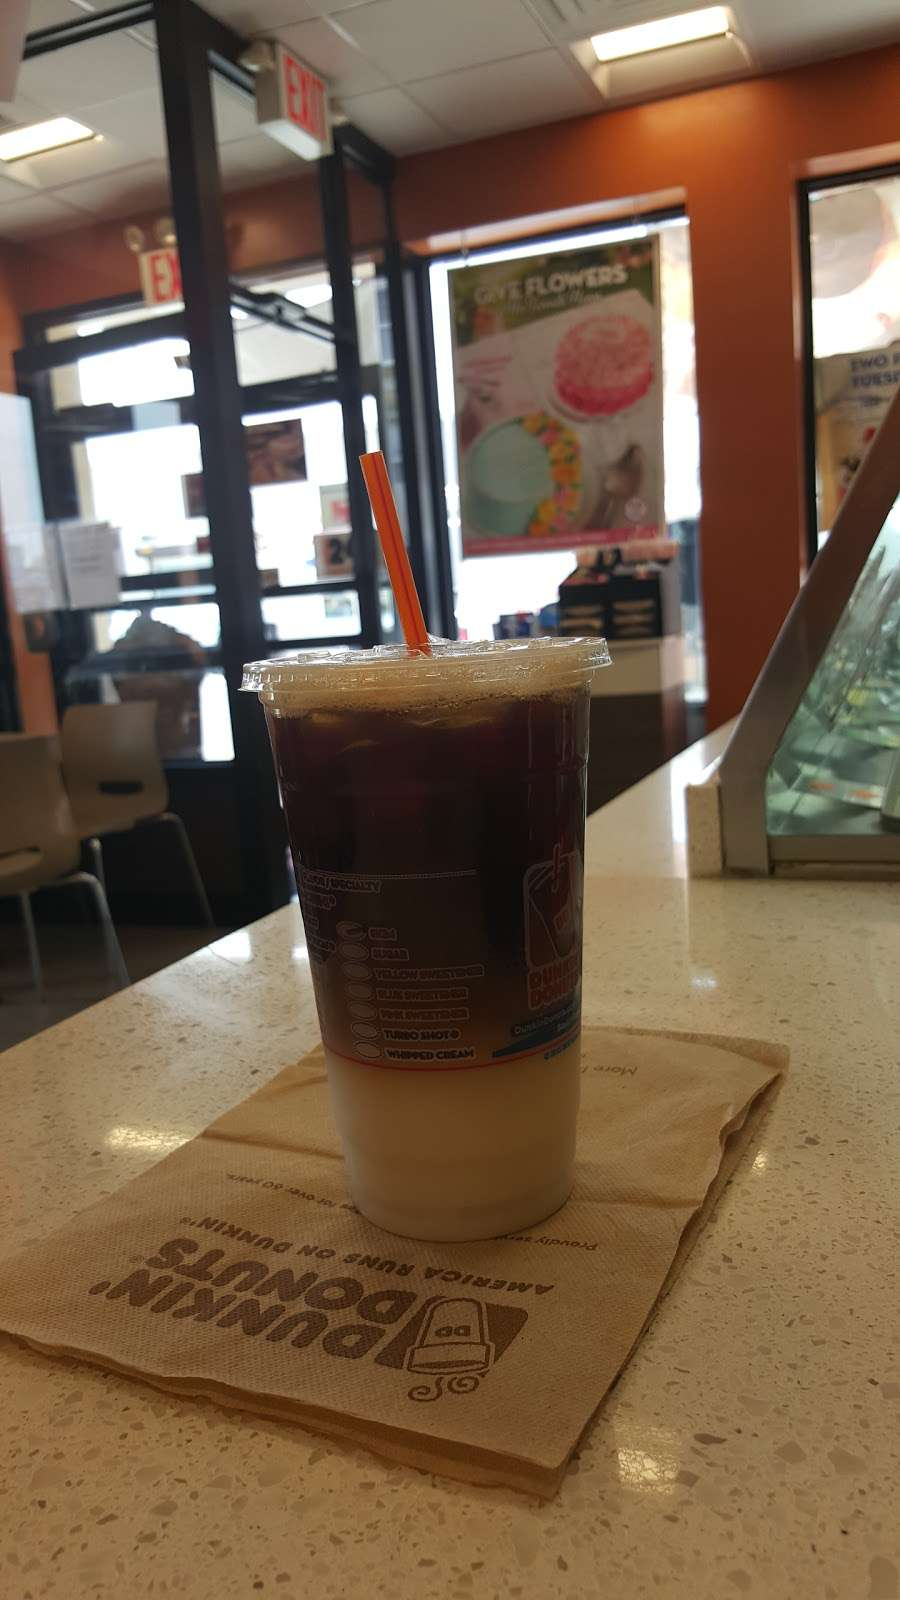 Dunkin Donuts - cafe  | Photo 6 of 10 | Address: 1375 Rockaway Pkwy, Brooklyn, NY 11236, USA | Phone: (718) 257-6490